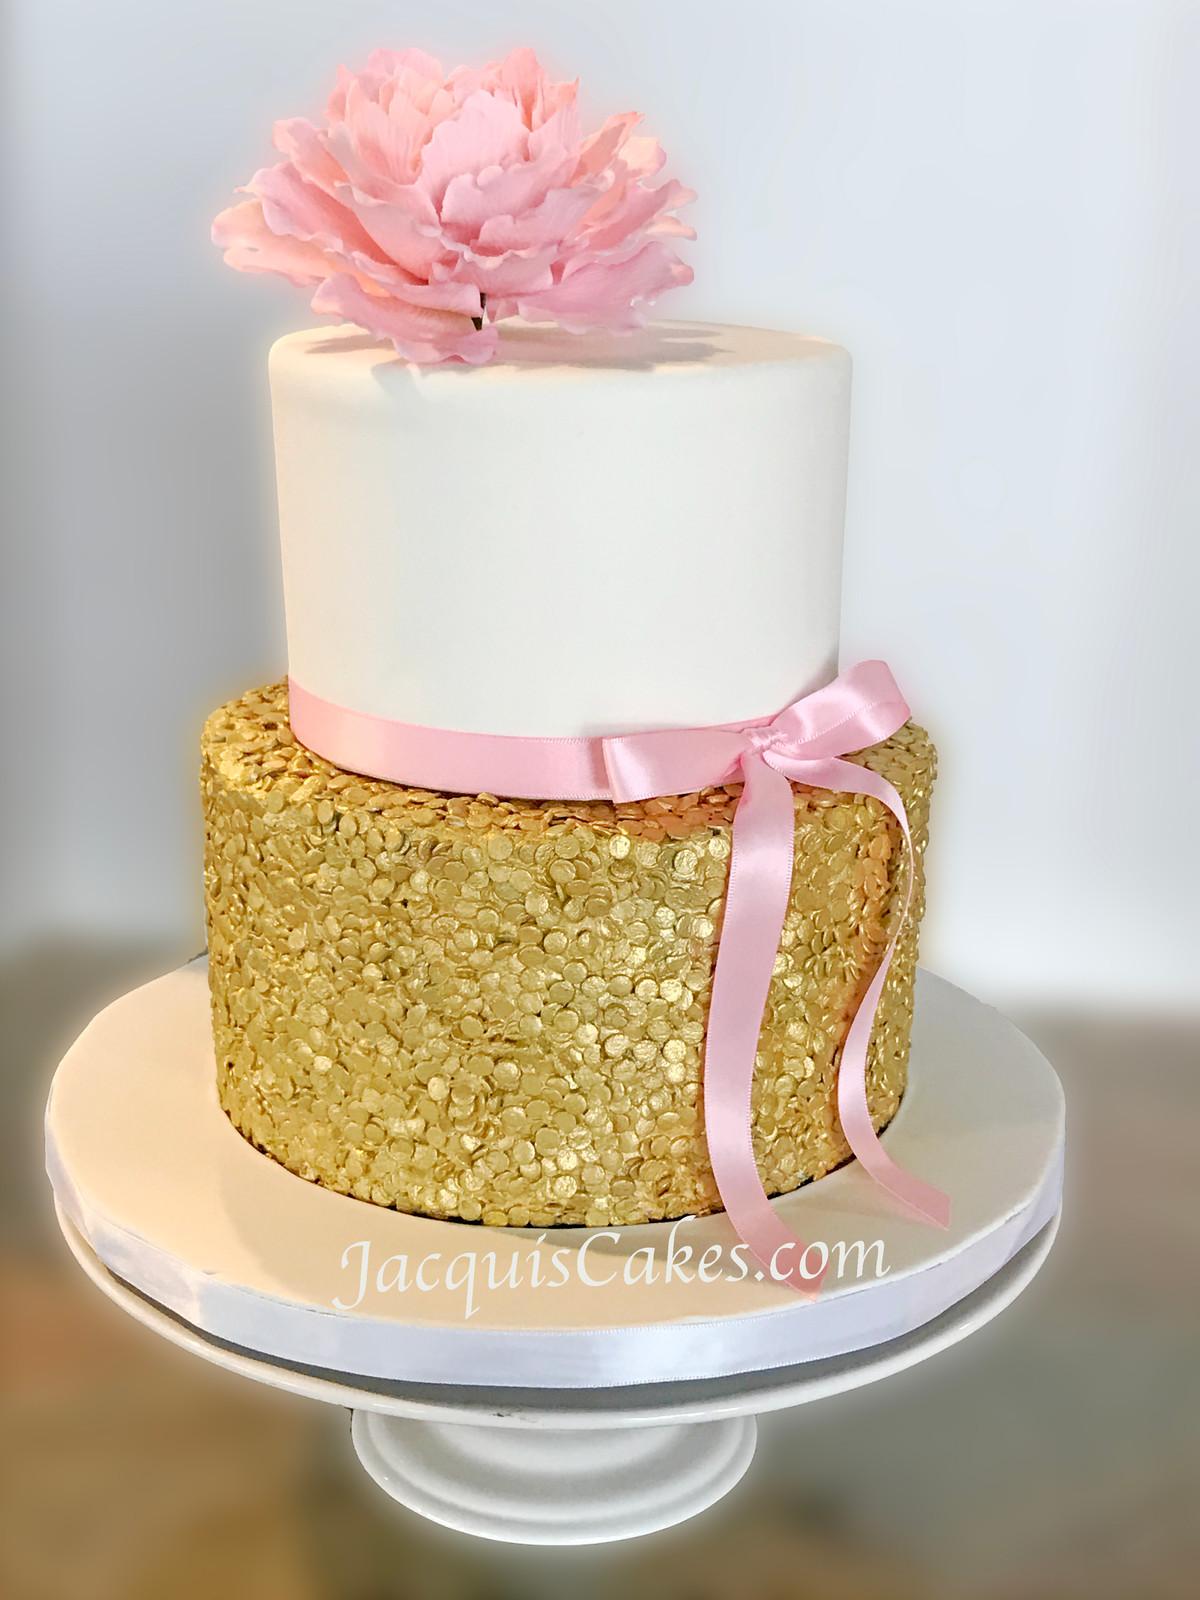 Jacqui\'s Cakes | Fondant Wedding Cakes